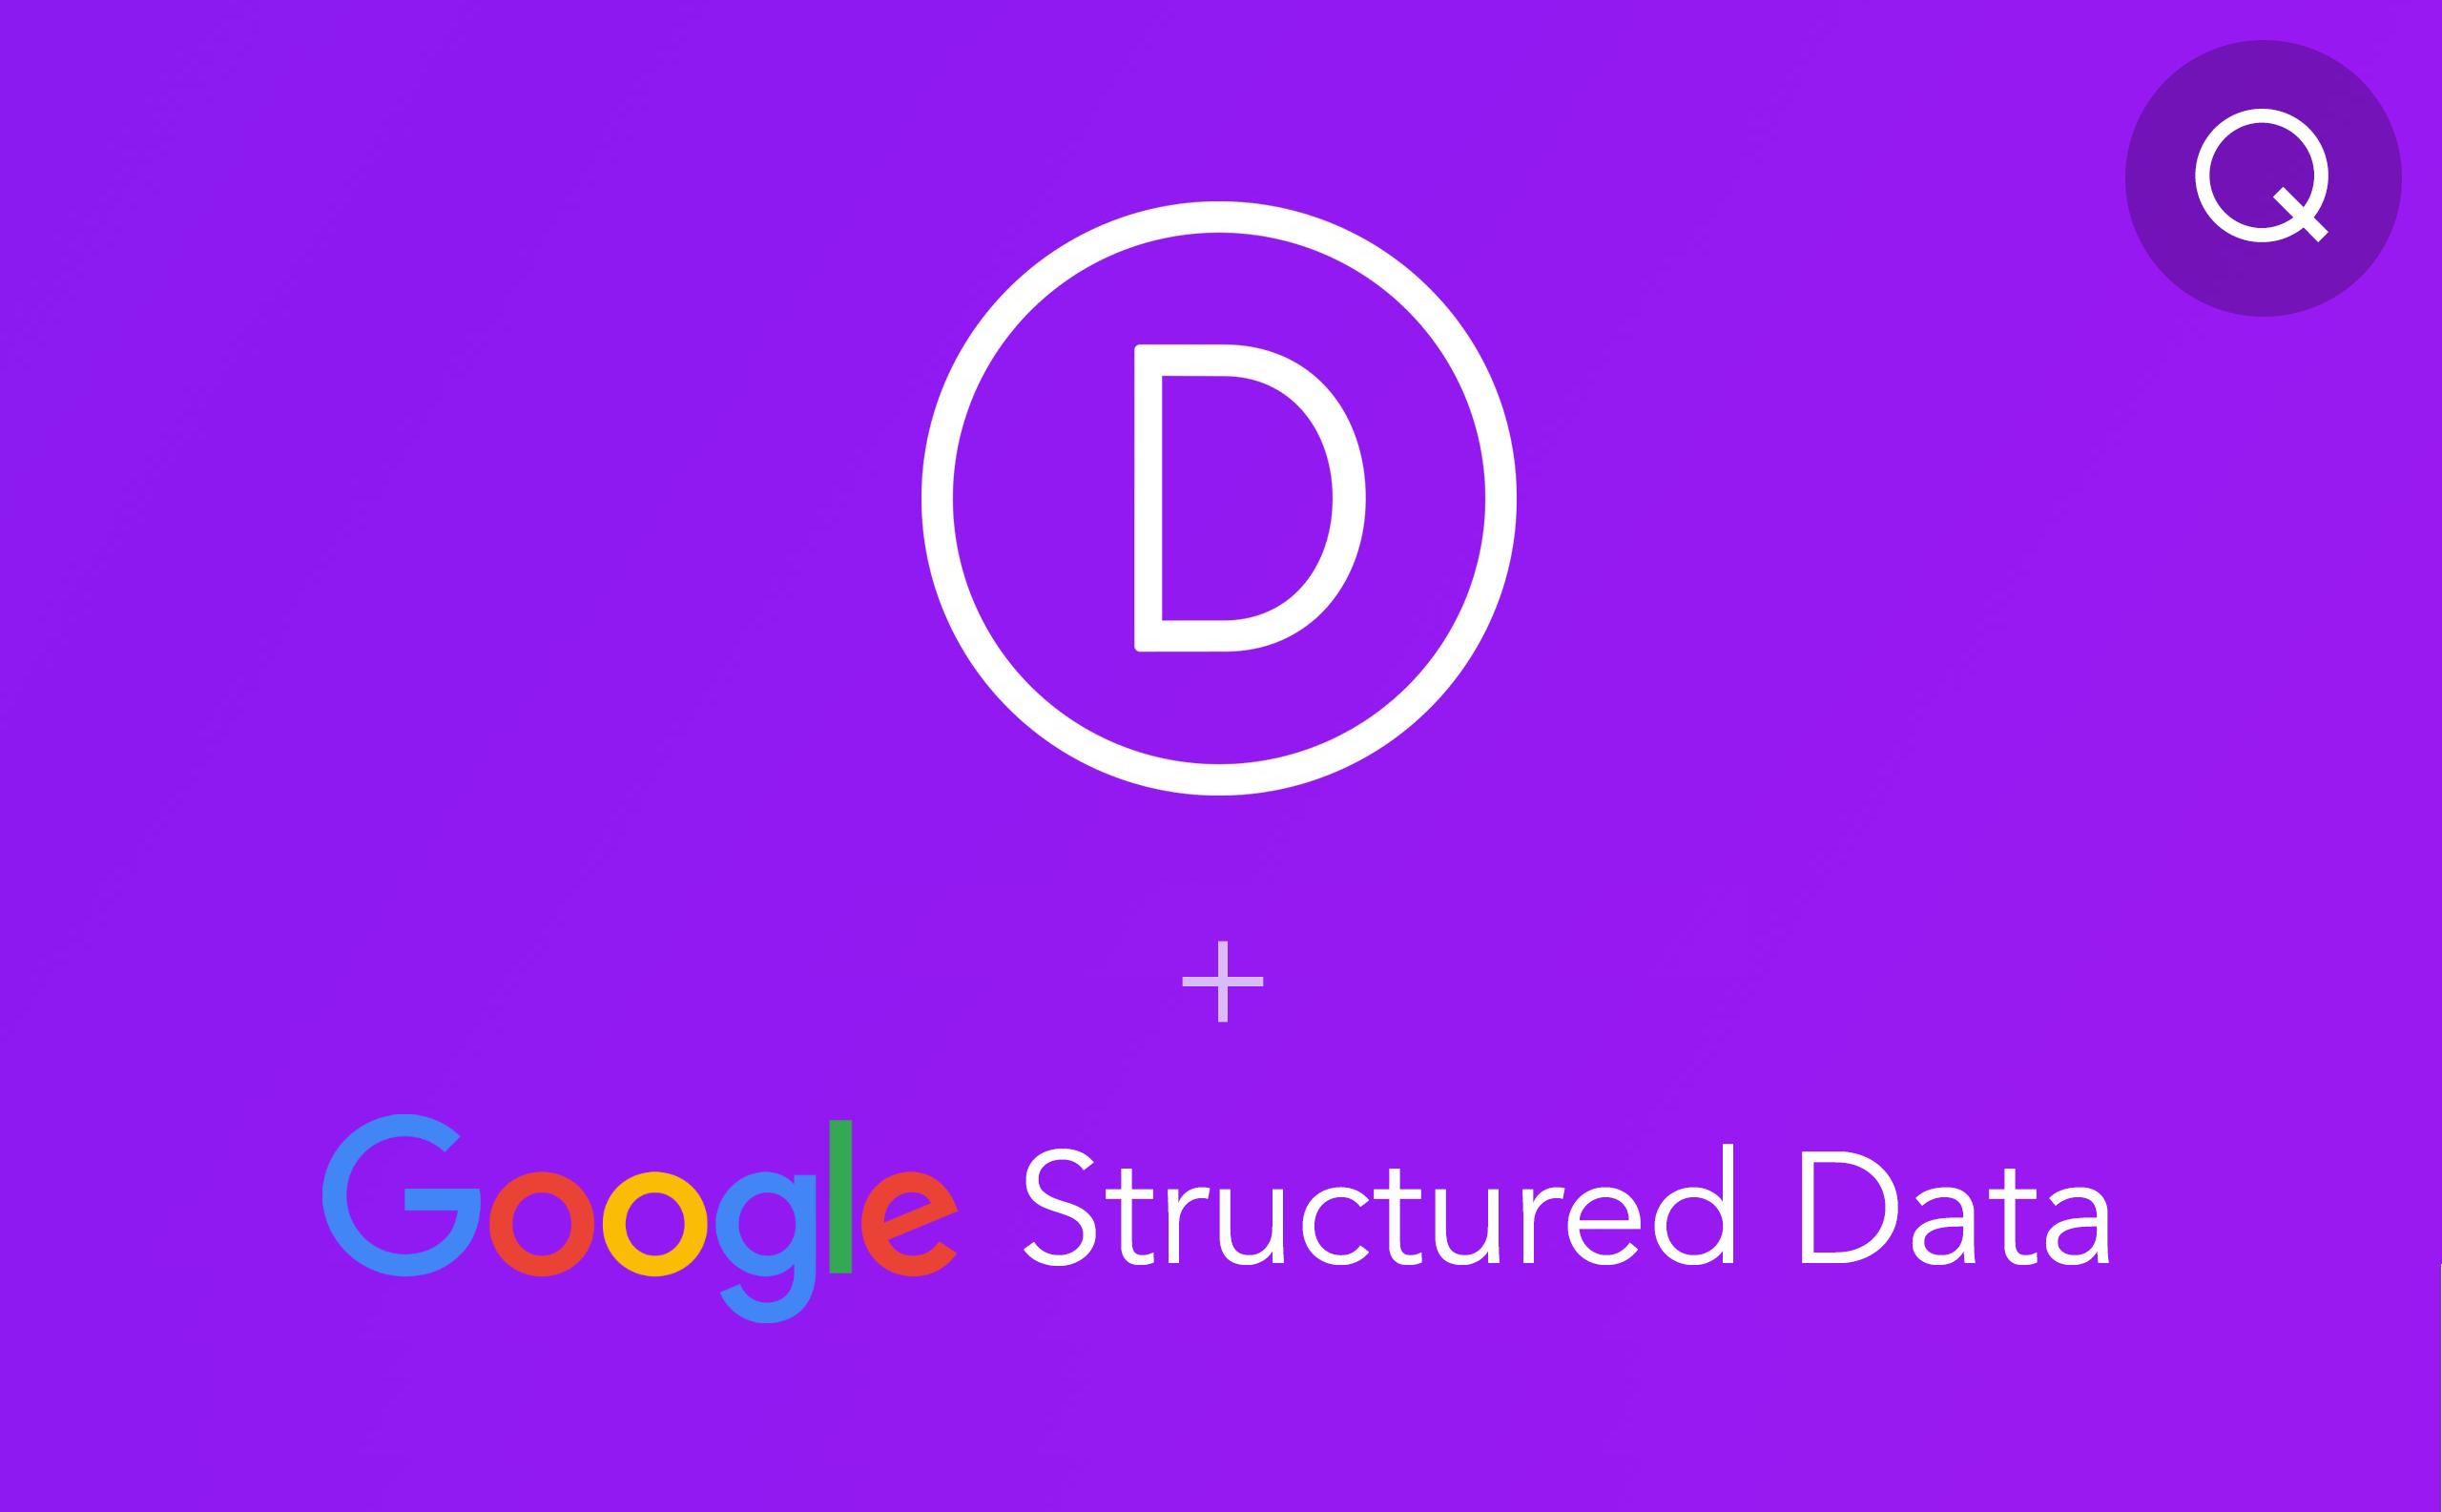 Google Structured data in Divi theme